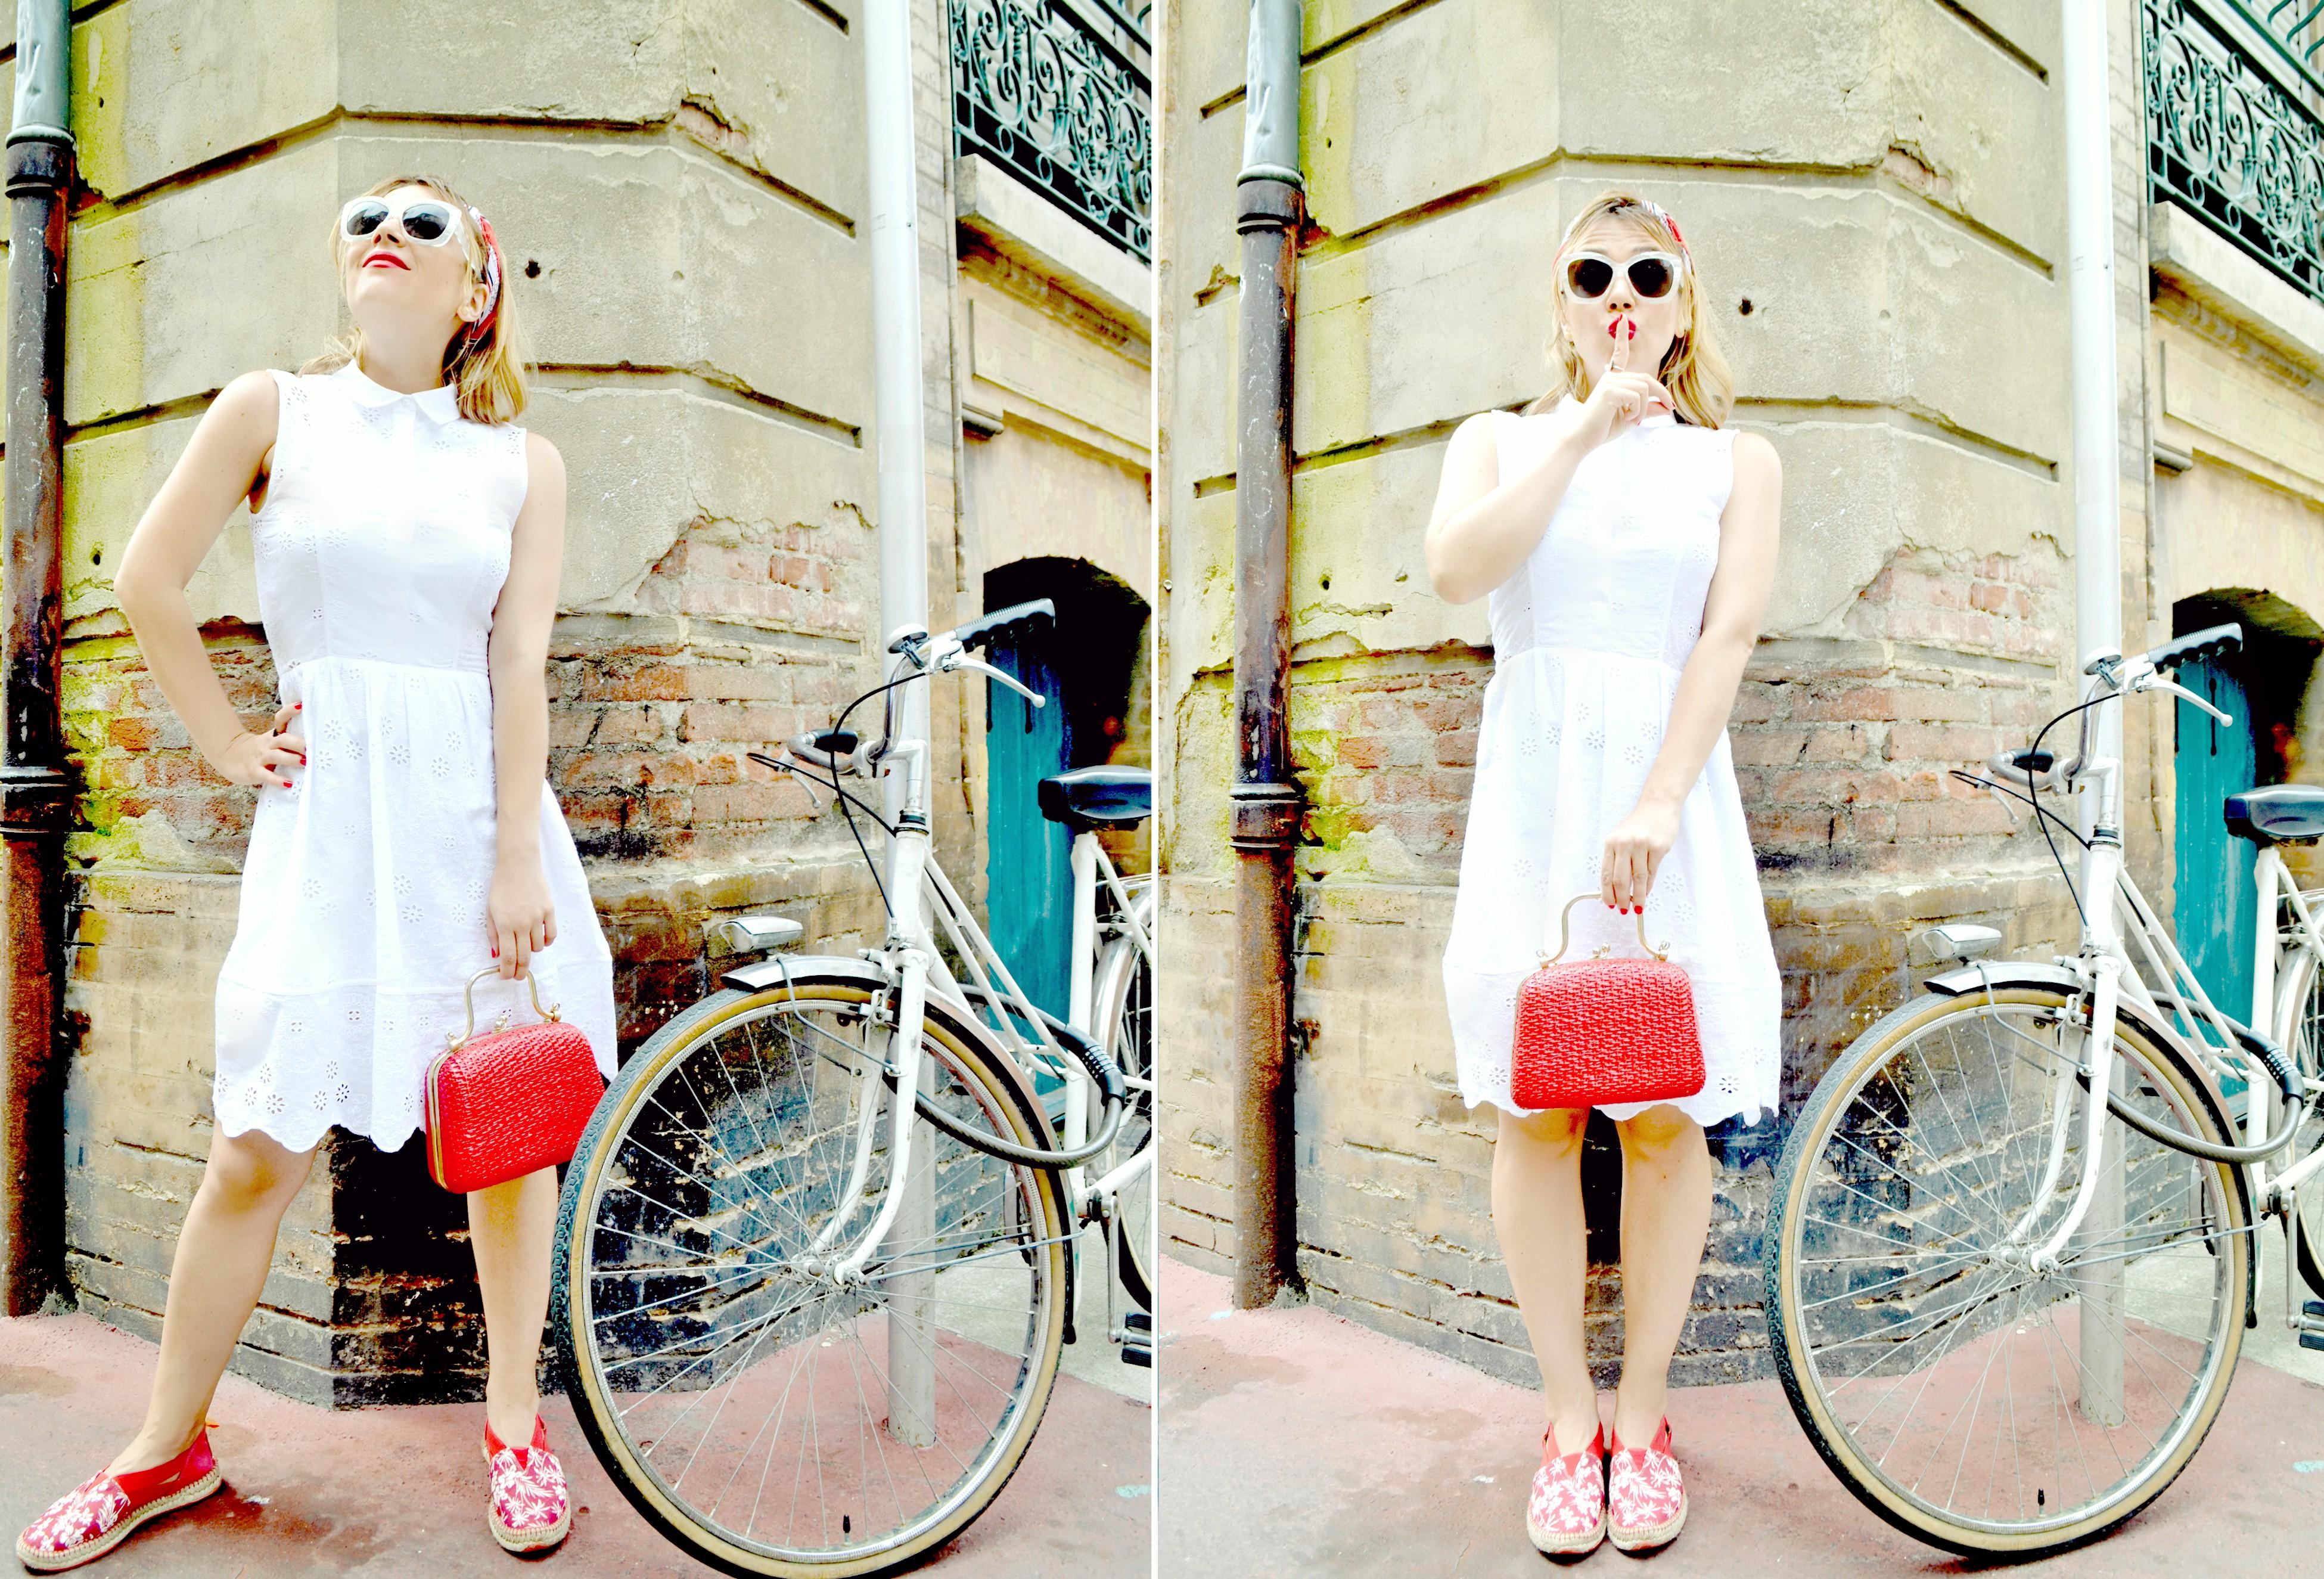 Vestido-blanco-summer-look-alpargatas-instint-ChicAdicta-blog-de-moda-Chic-Adicta-influencer-fashiontravel-Toulouse-PiensaenChic-Piensa-en-Chic